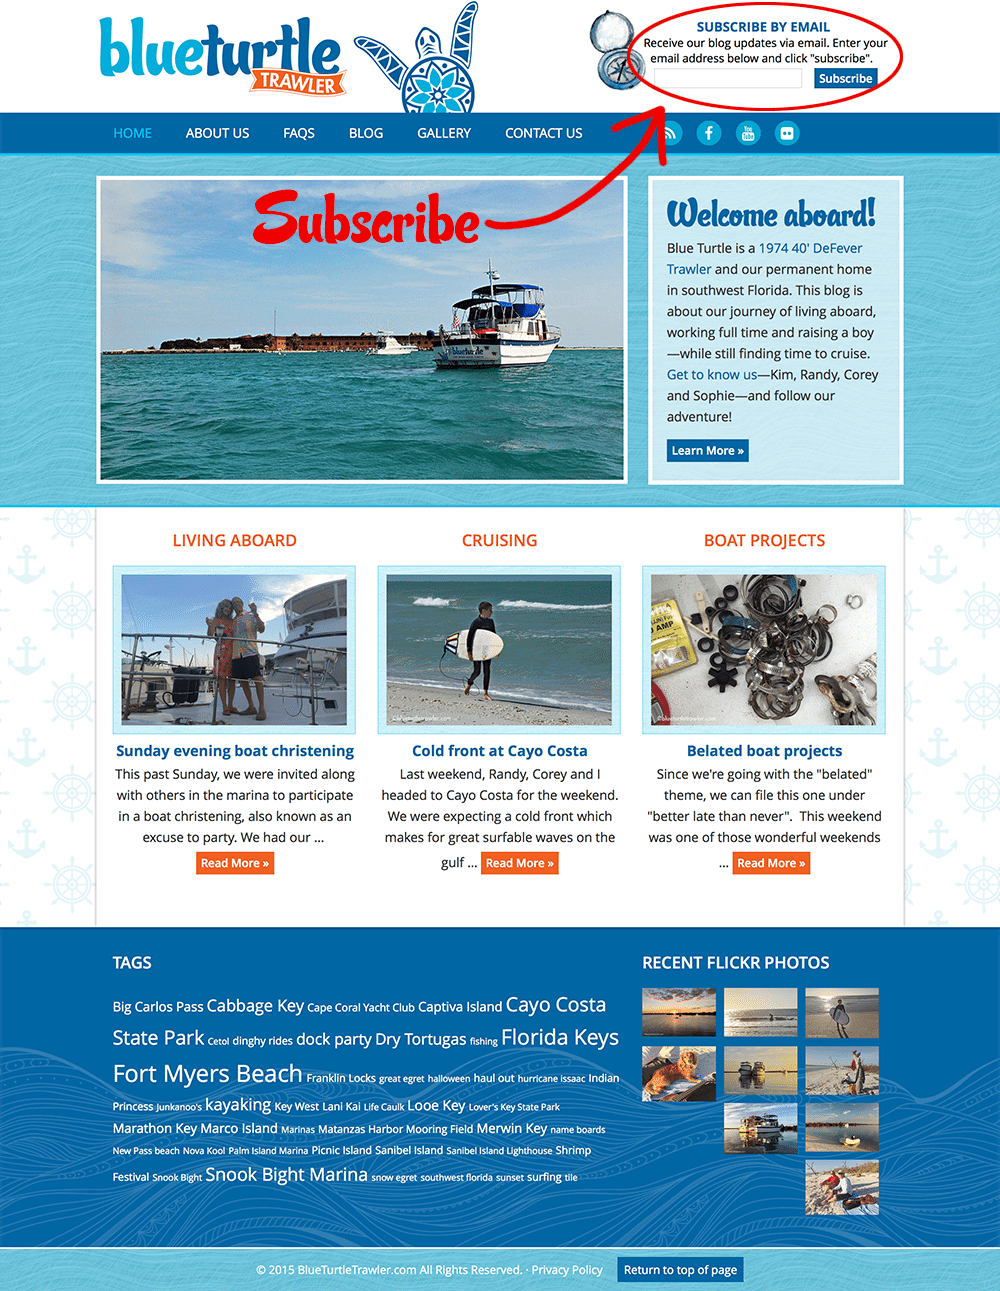 Blue-Turtle-Trawler-Home